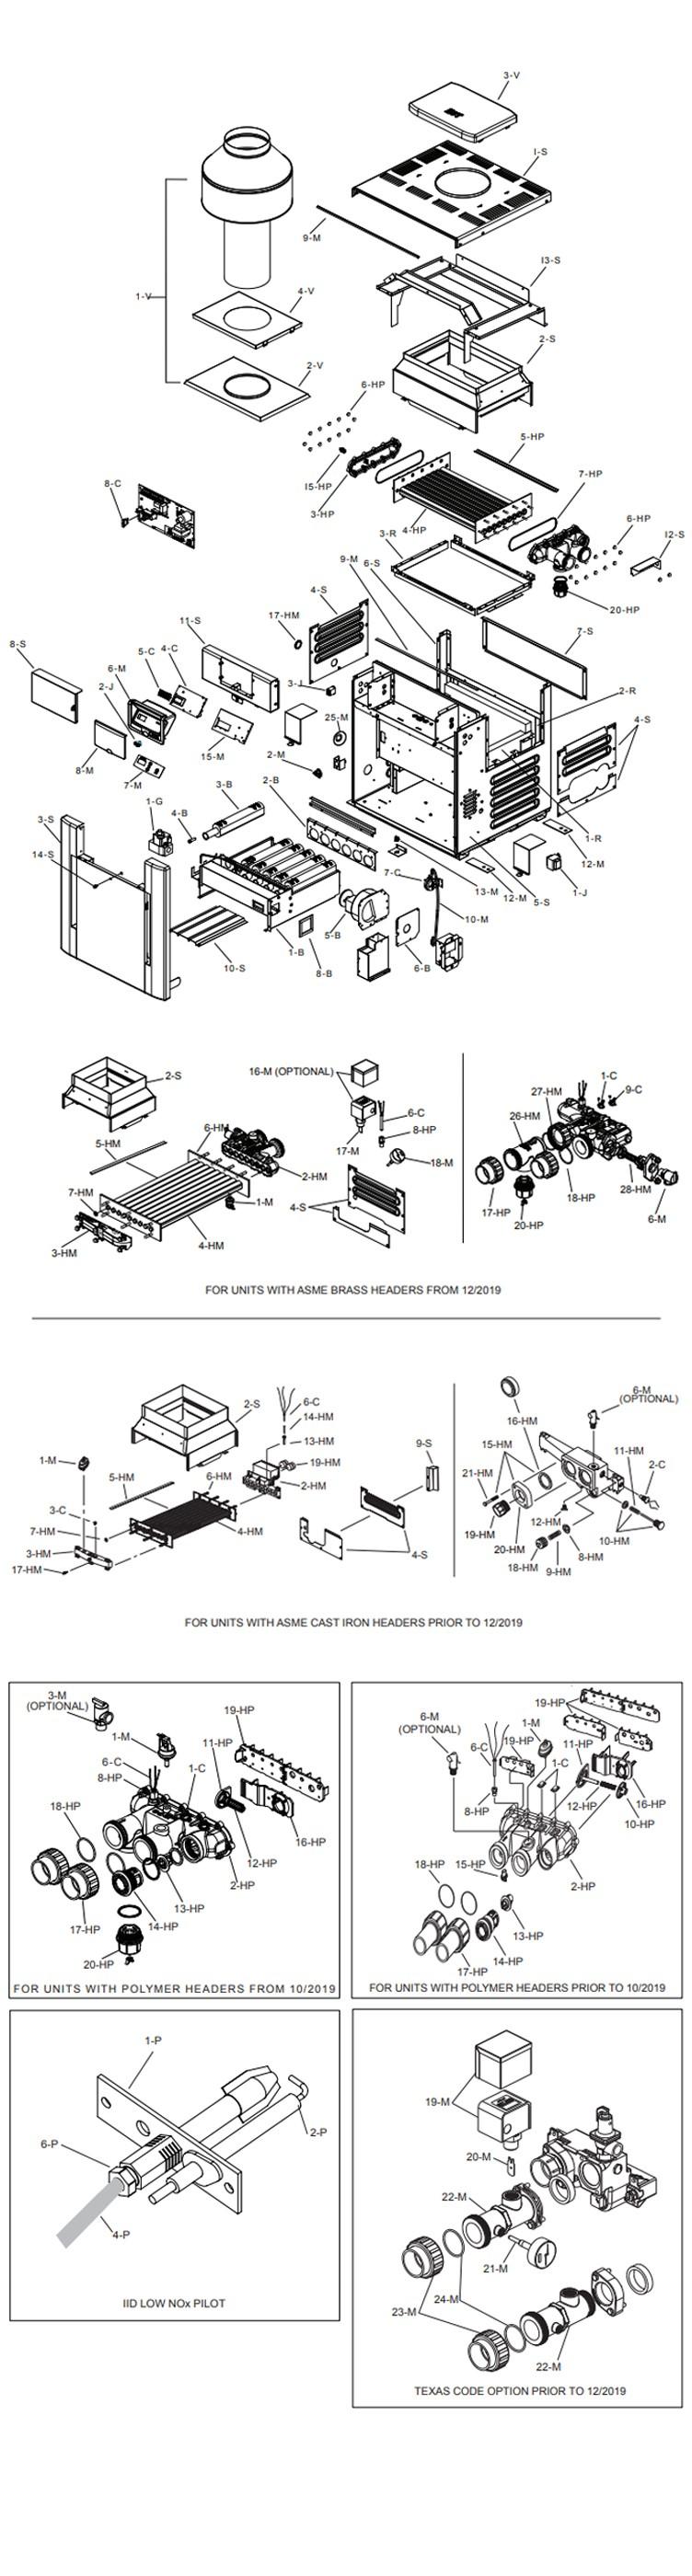 Raypak Digital Low NOX ASME Natural Gas Commercial Swimming Pool Heater | 266k BTU | Altitude 0-5000 Ft | C-R267A-EN-C 009293 | B-R267A-EN-C #26 017706 Parts Schematic